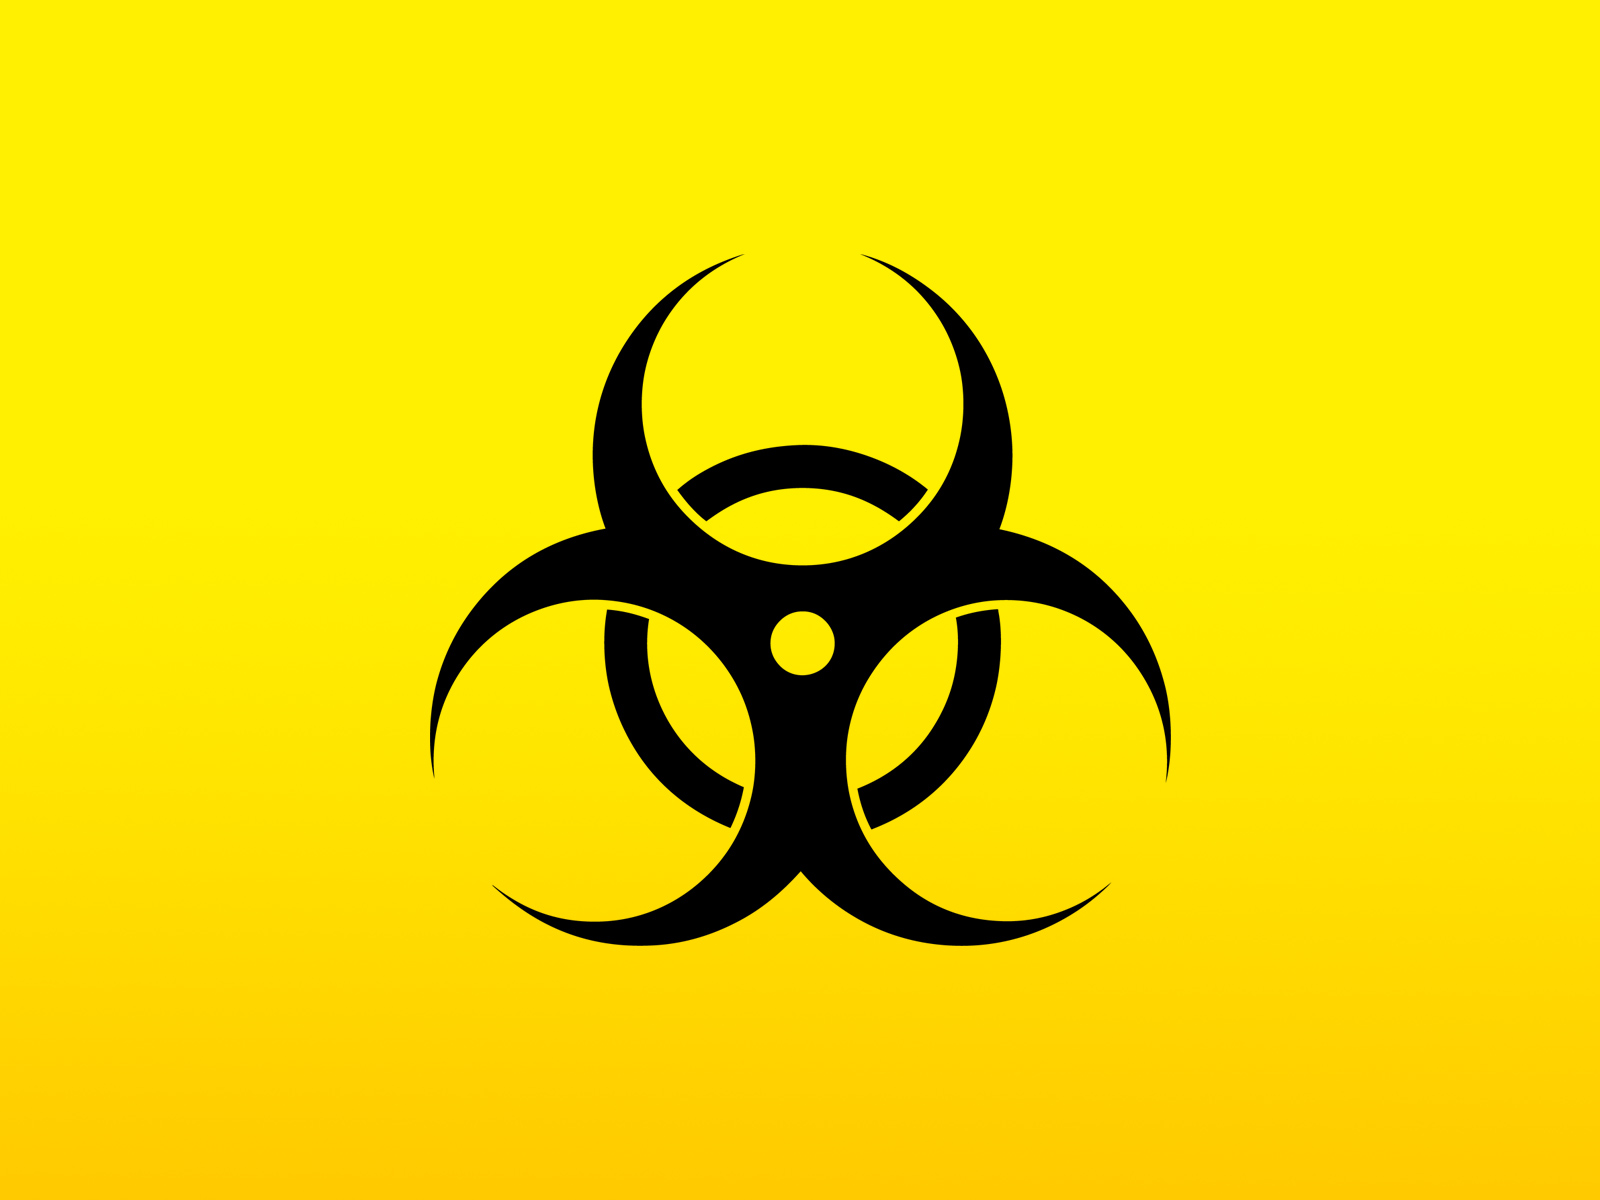 radiation symbol wallpaper clipart best